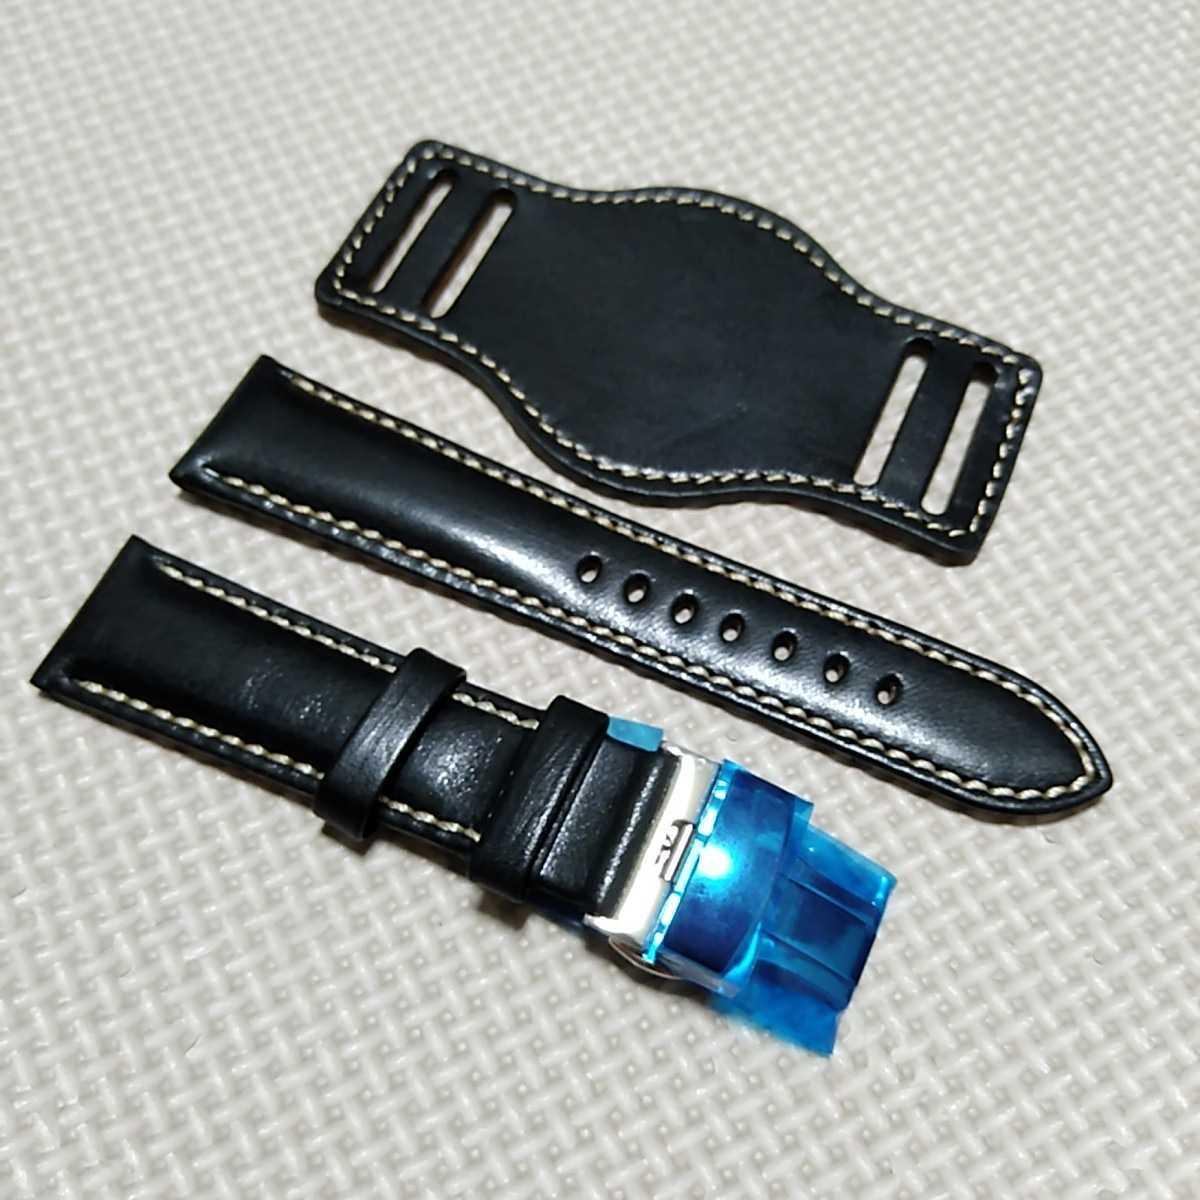 No71 ブンド BUND 本革レザーベルト 腕時計ベルト 交換用ストラップ ブラック 21mm 未使用 Dバックル 高品質 ドイツパイロット 空軍_画像1